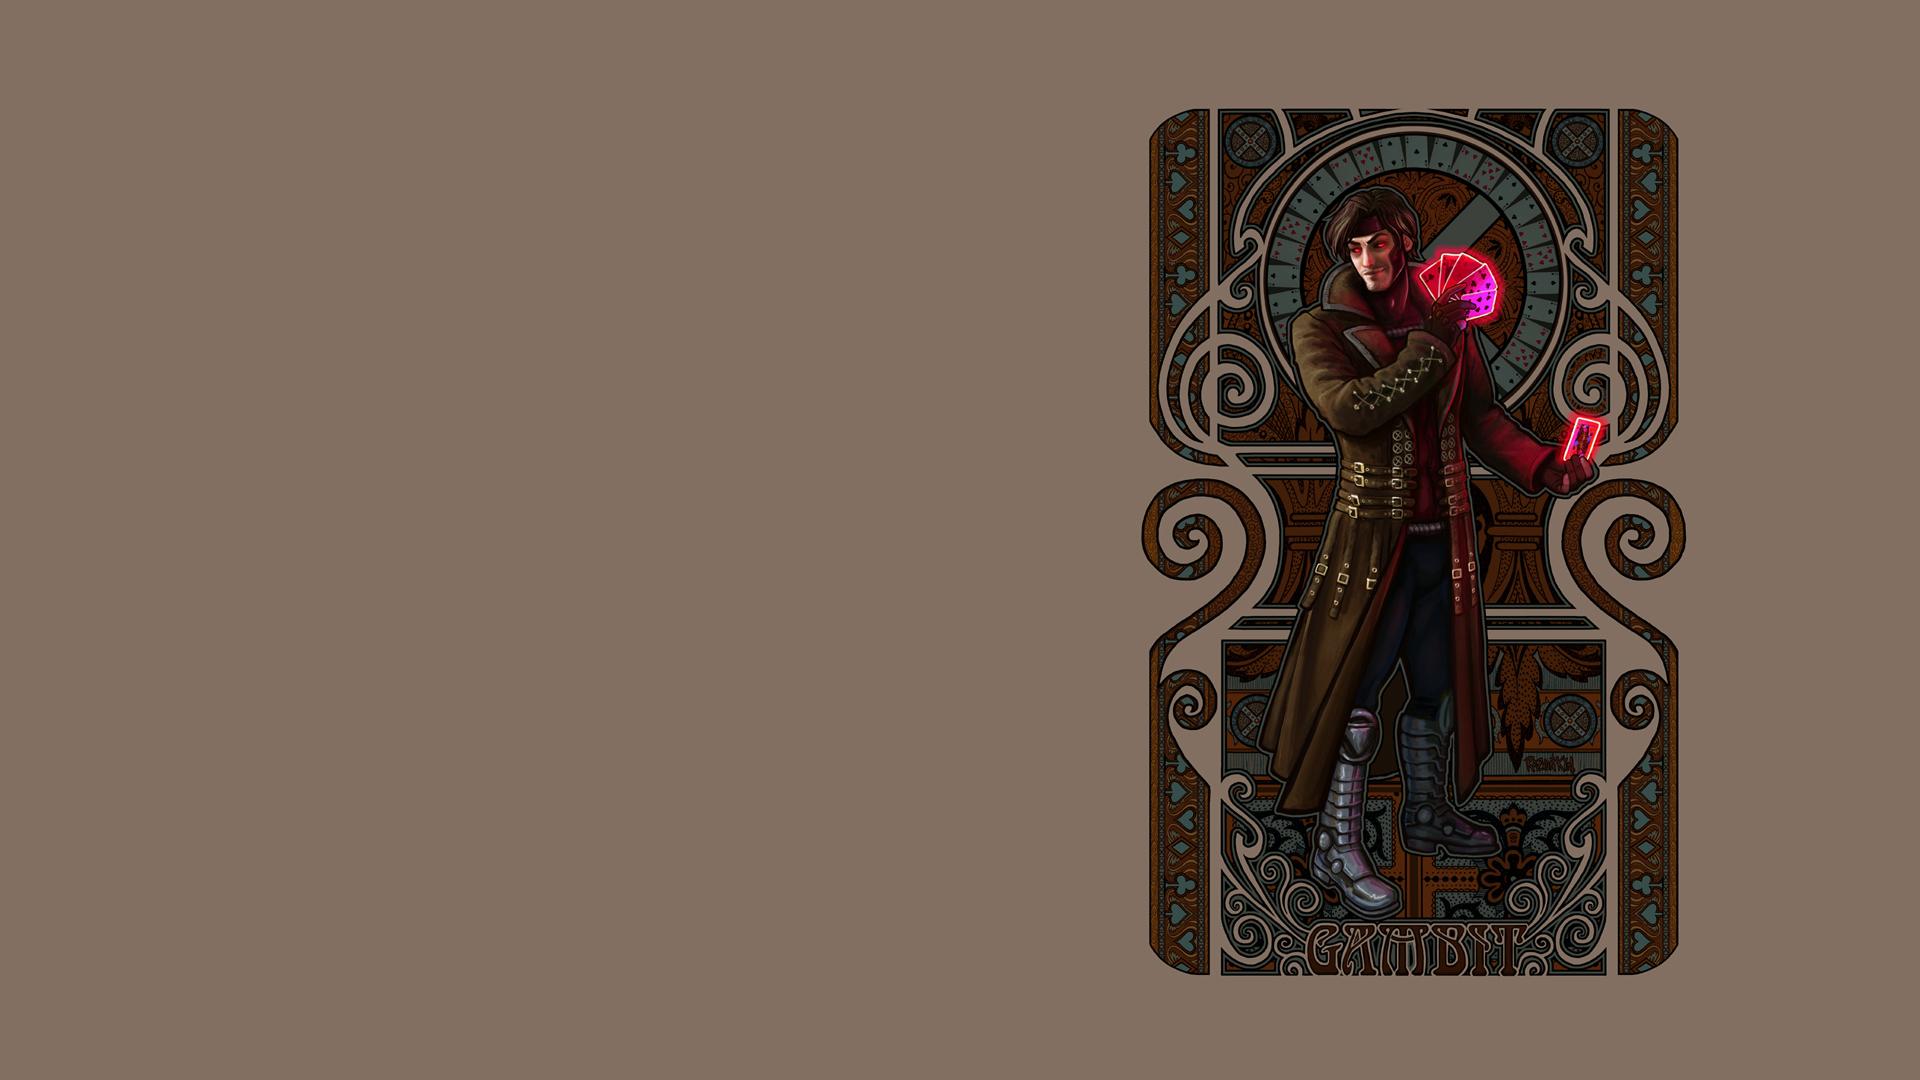 Gambit HD Wallpaper Background Image 1920x1080 ID214405 1920x1080